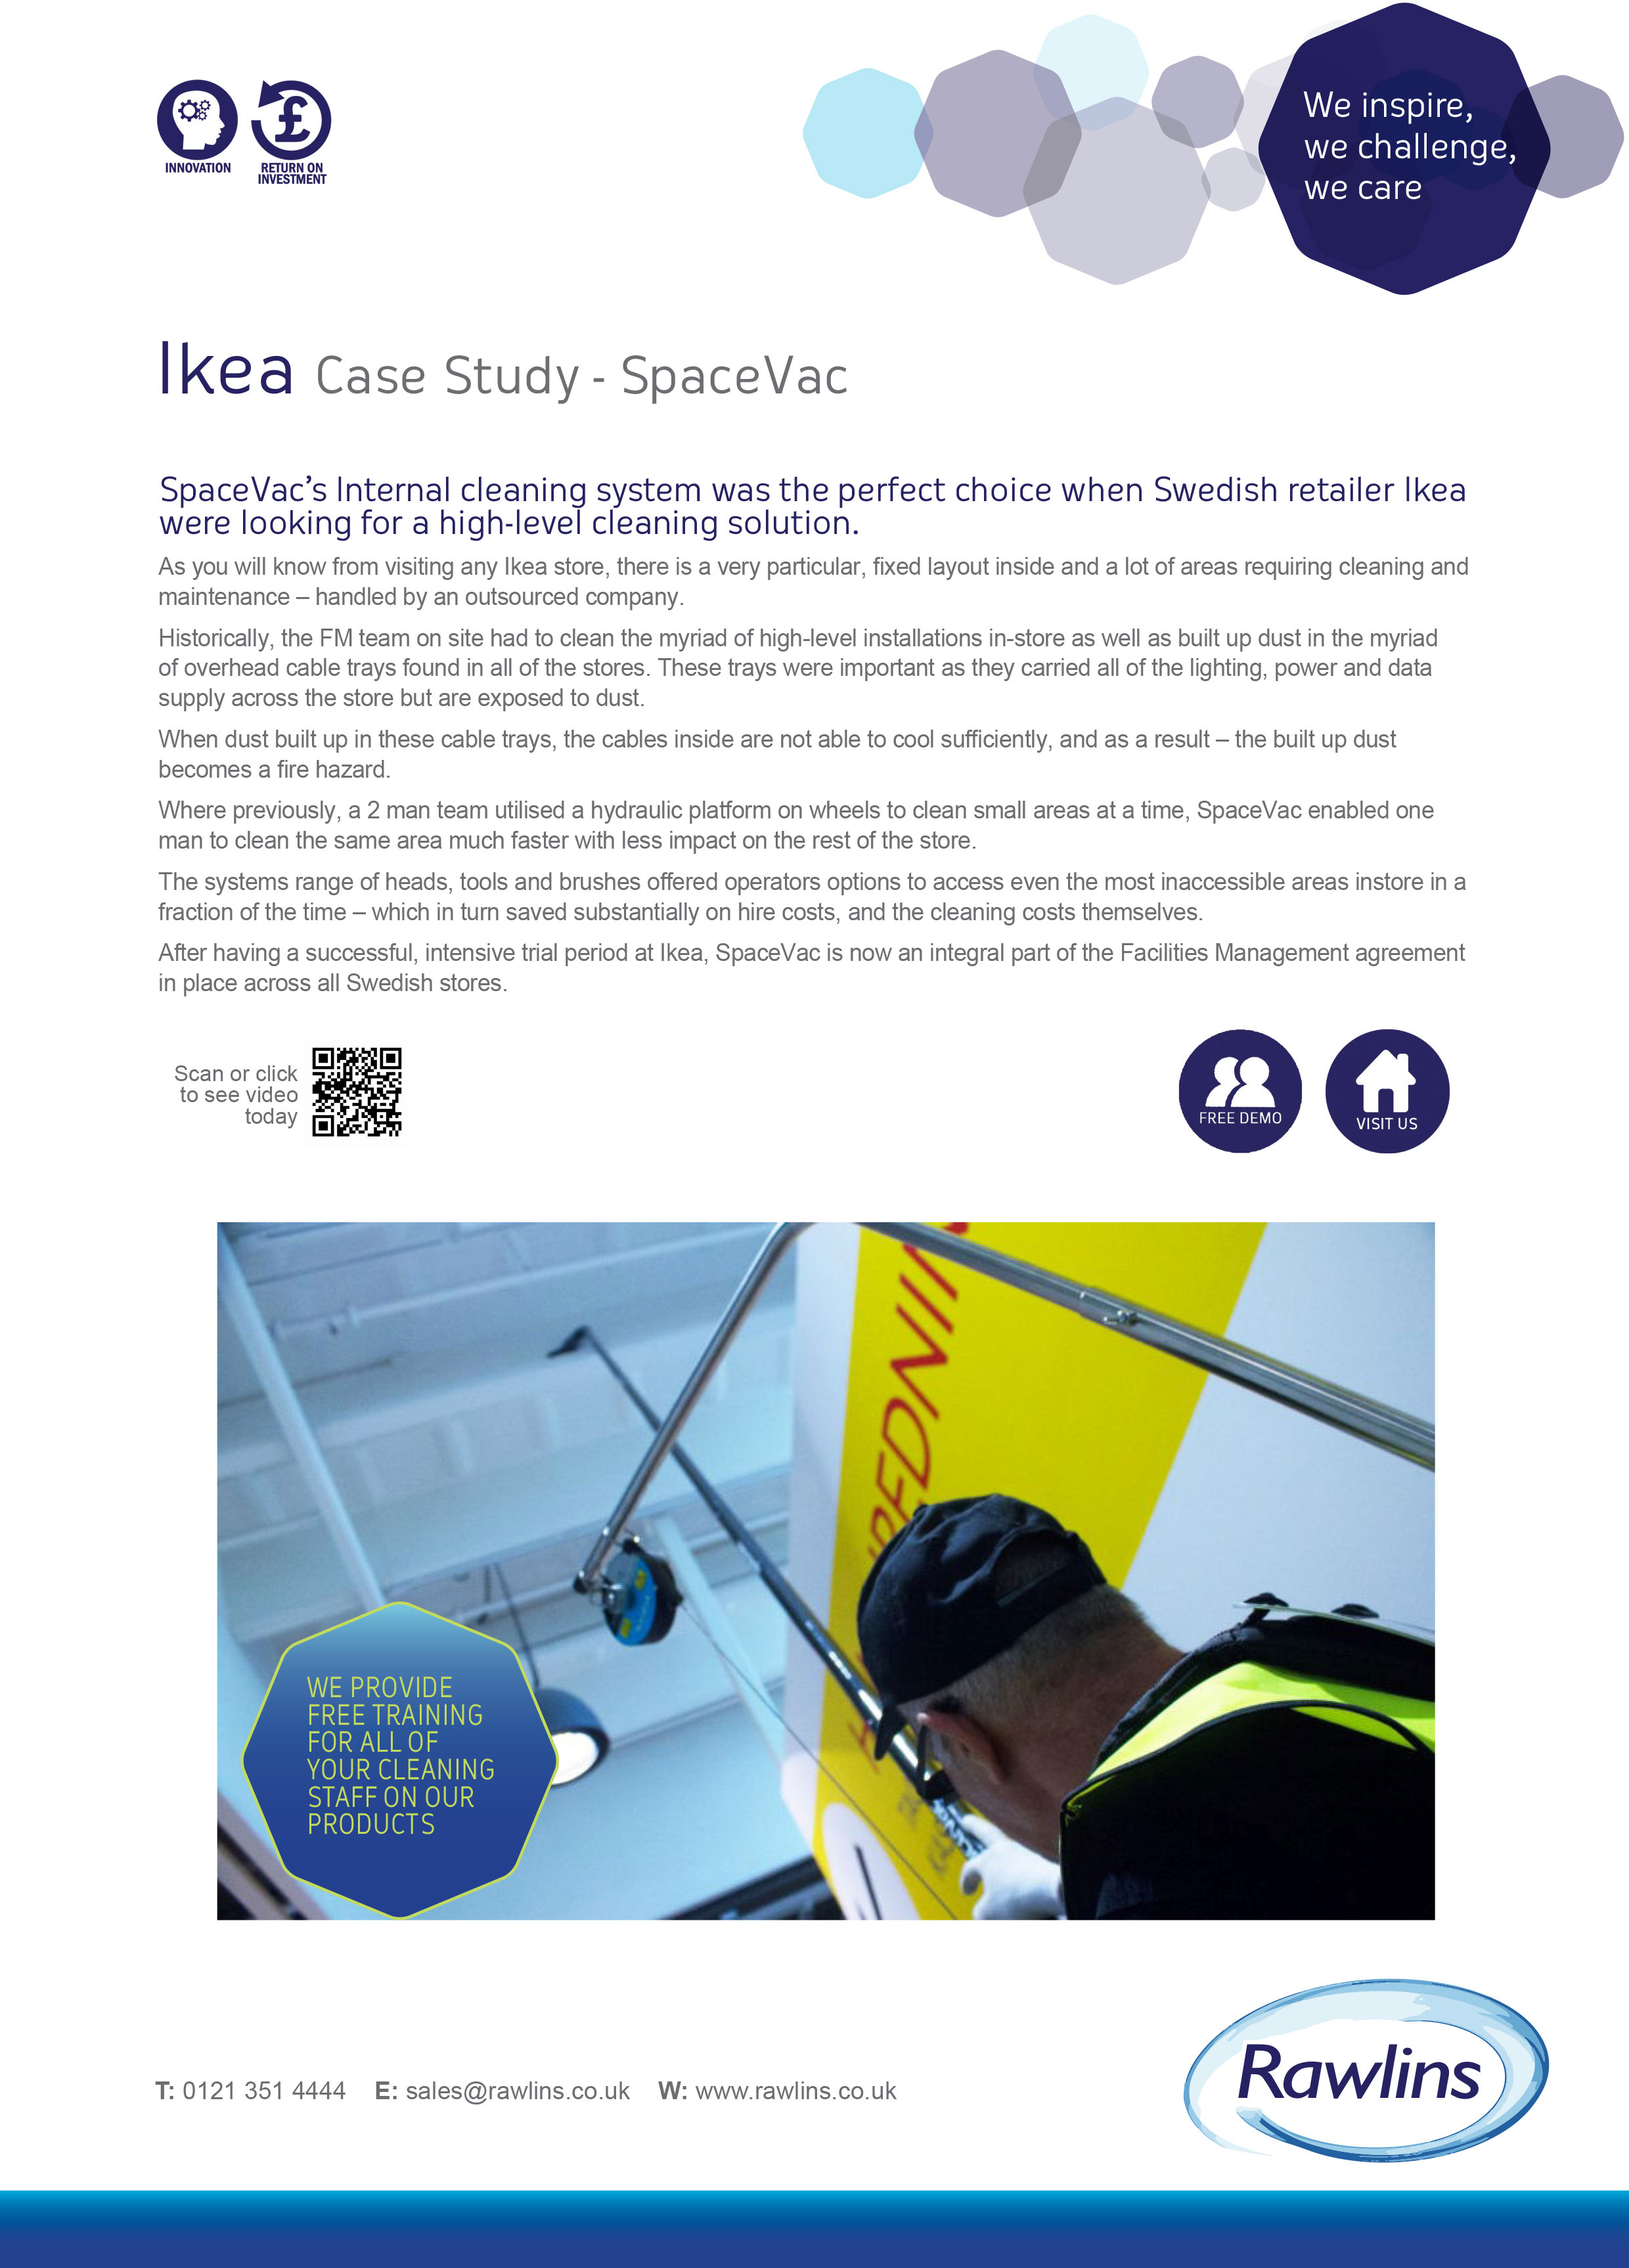 ikea-case-study